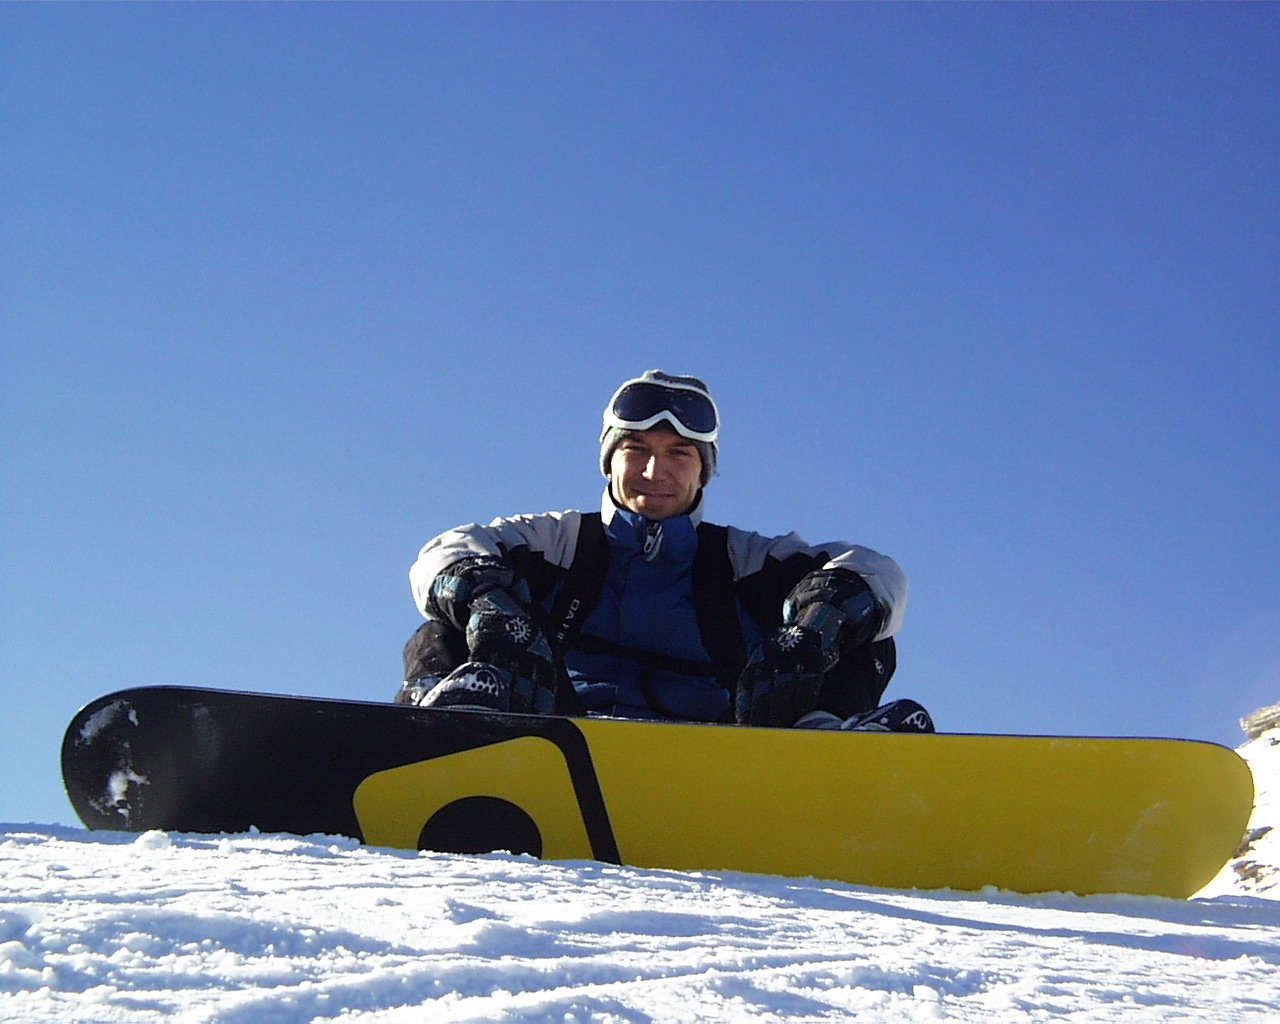 DW Snowboard original